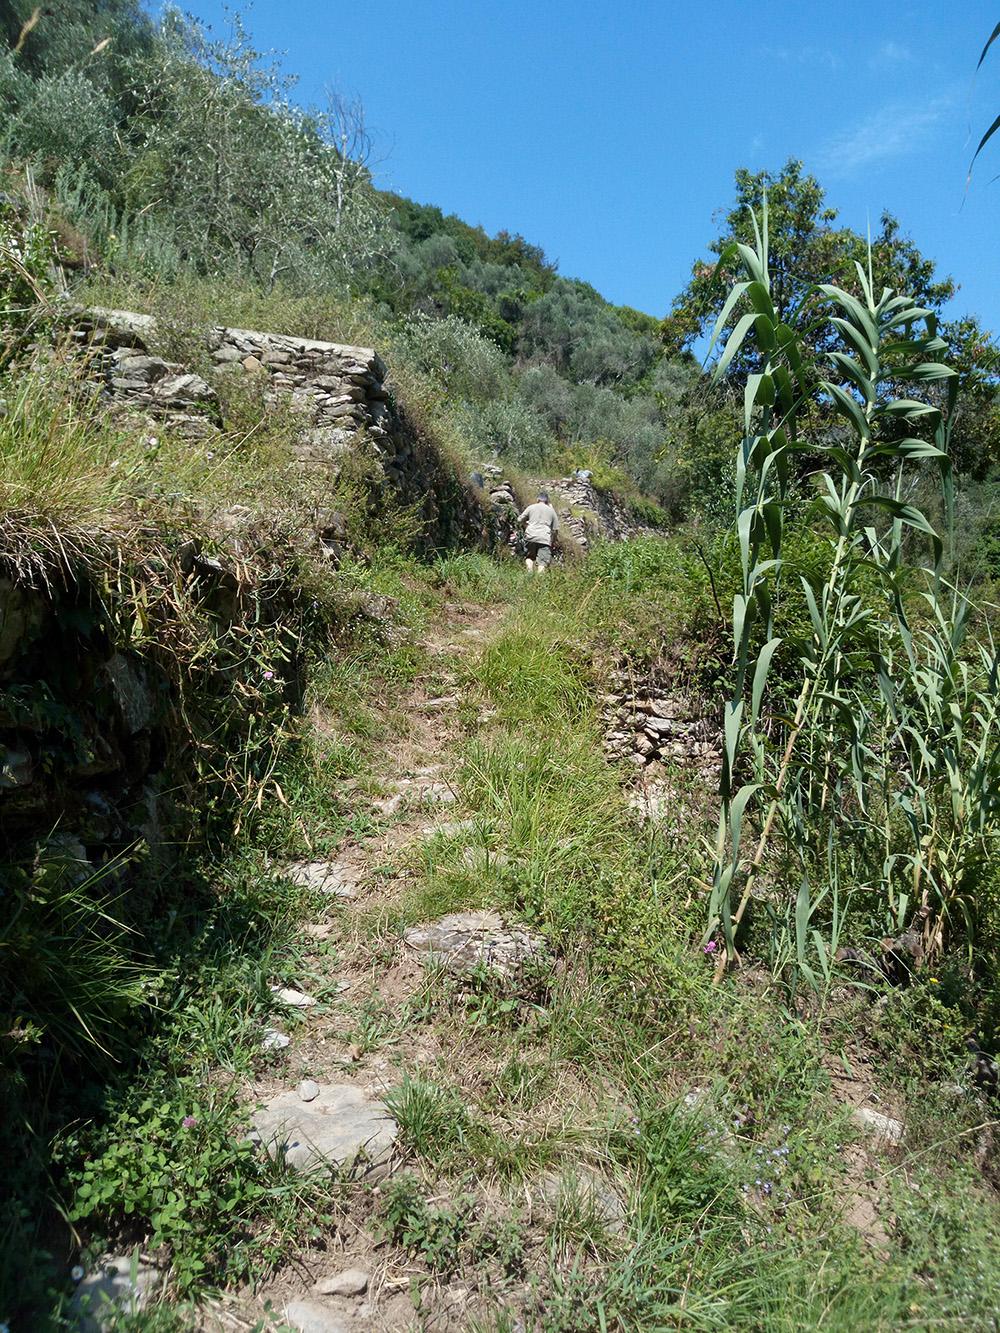 towards Montallegro